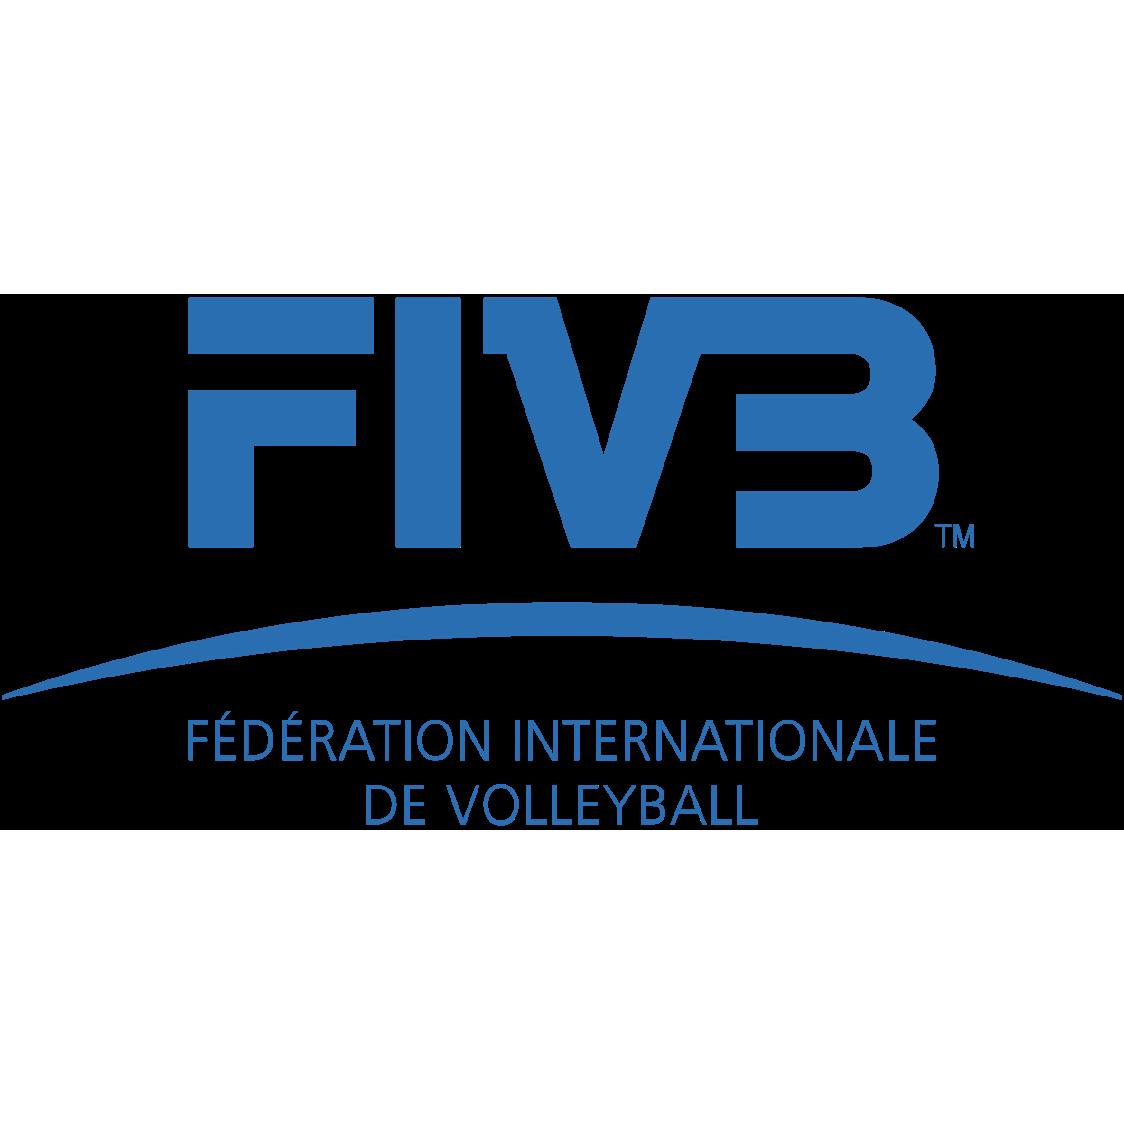 2021 FIVB Volleyball World U20 Women's Championship